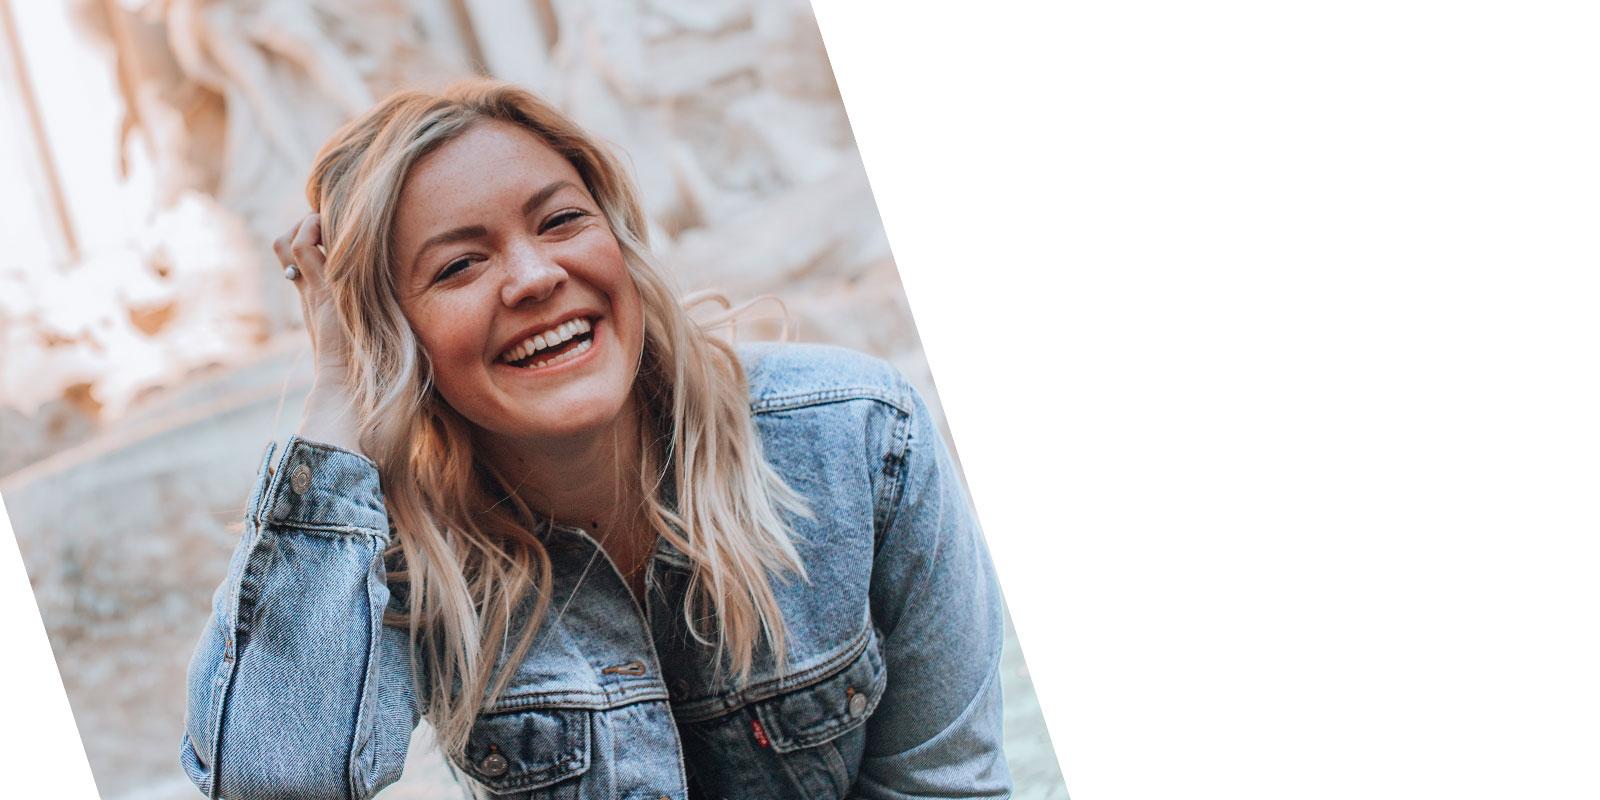 blonde Frau lachend mit Jeansjacke